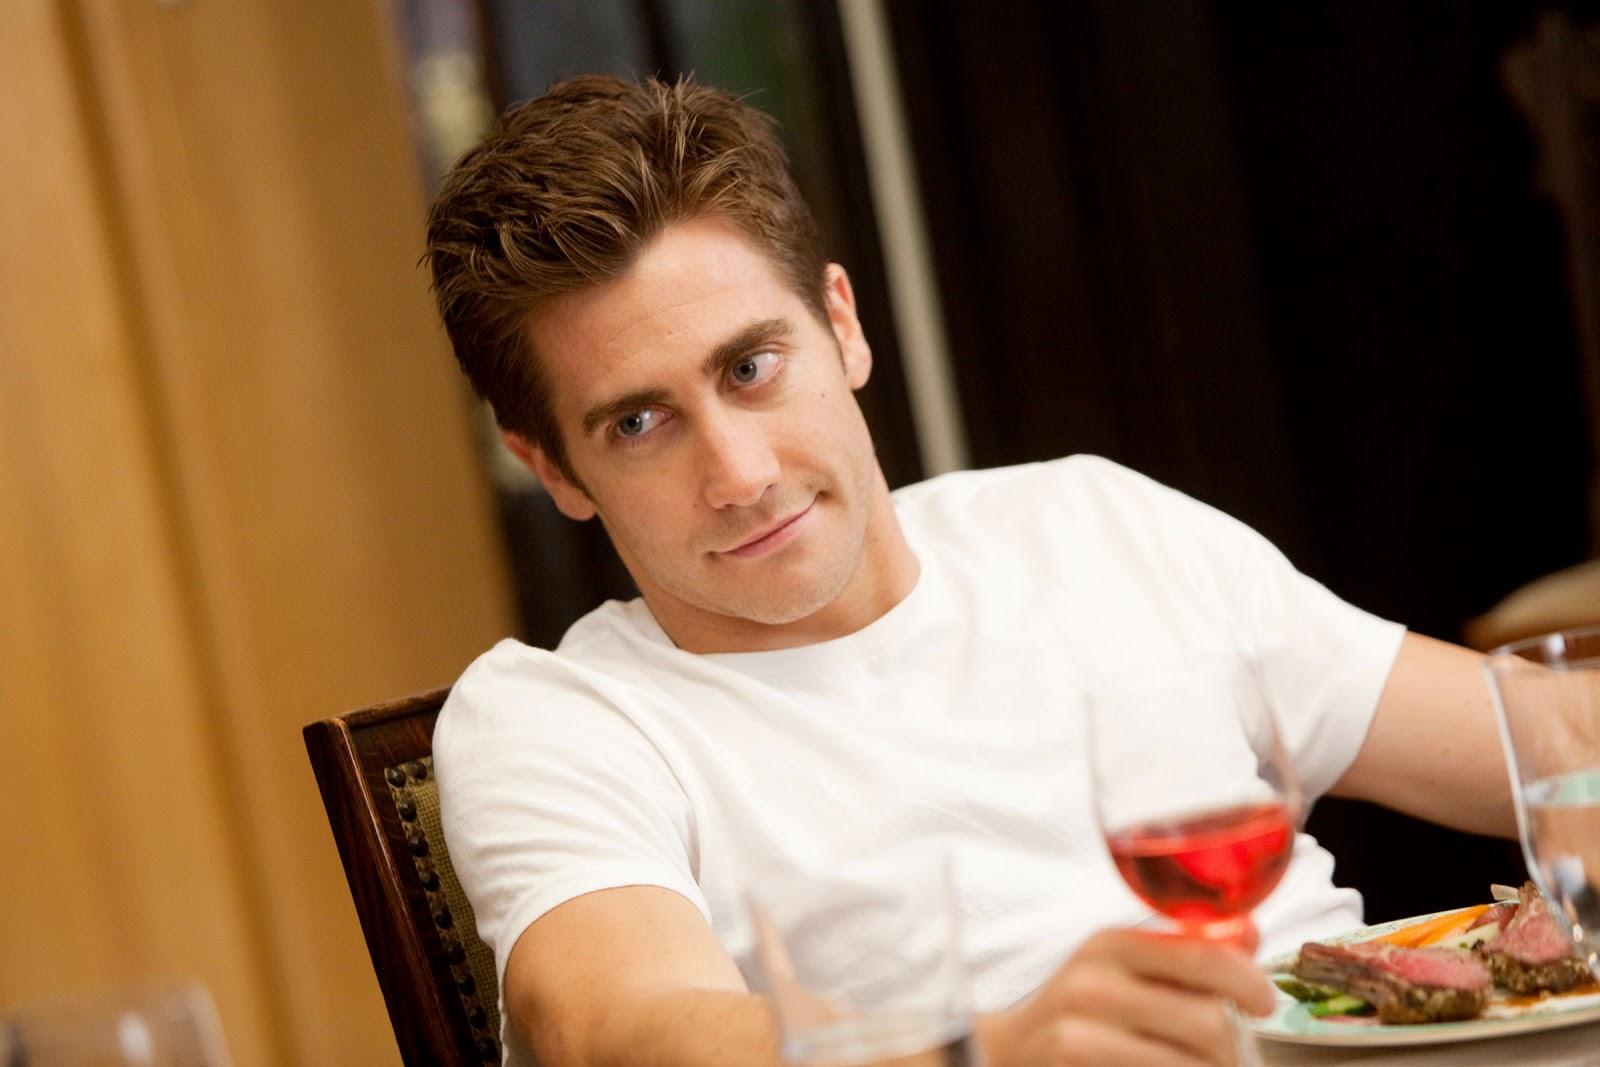 http://4.bp.blogspot.com/_kf6Cmm7gIGk/TUa2kMK0d7I/AAAAAAAACtg/6Ex0duPqhps/s1600/Jake+Gyllenhaal+Love+and+Other+Drugs.jpg